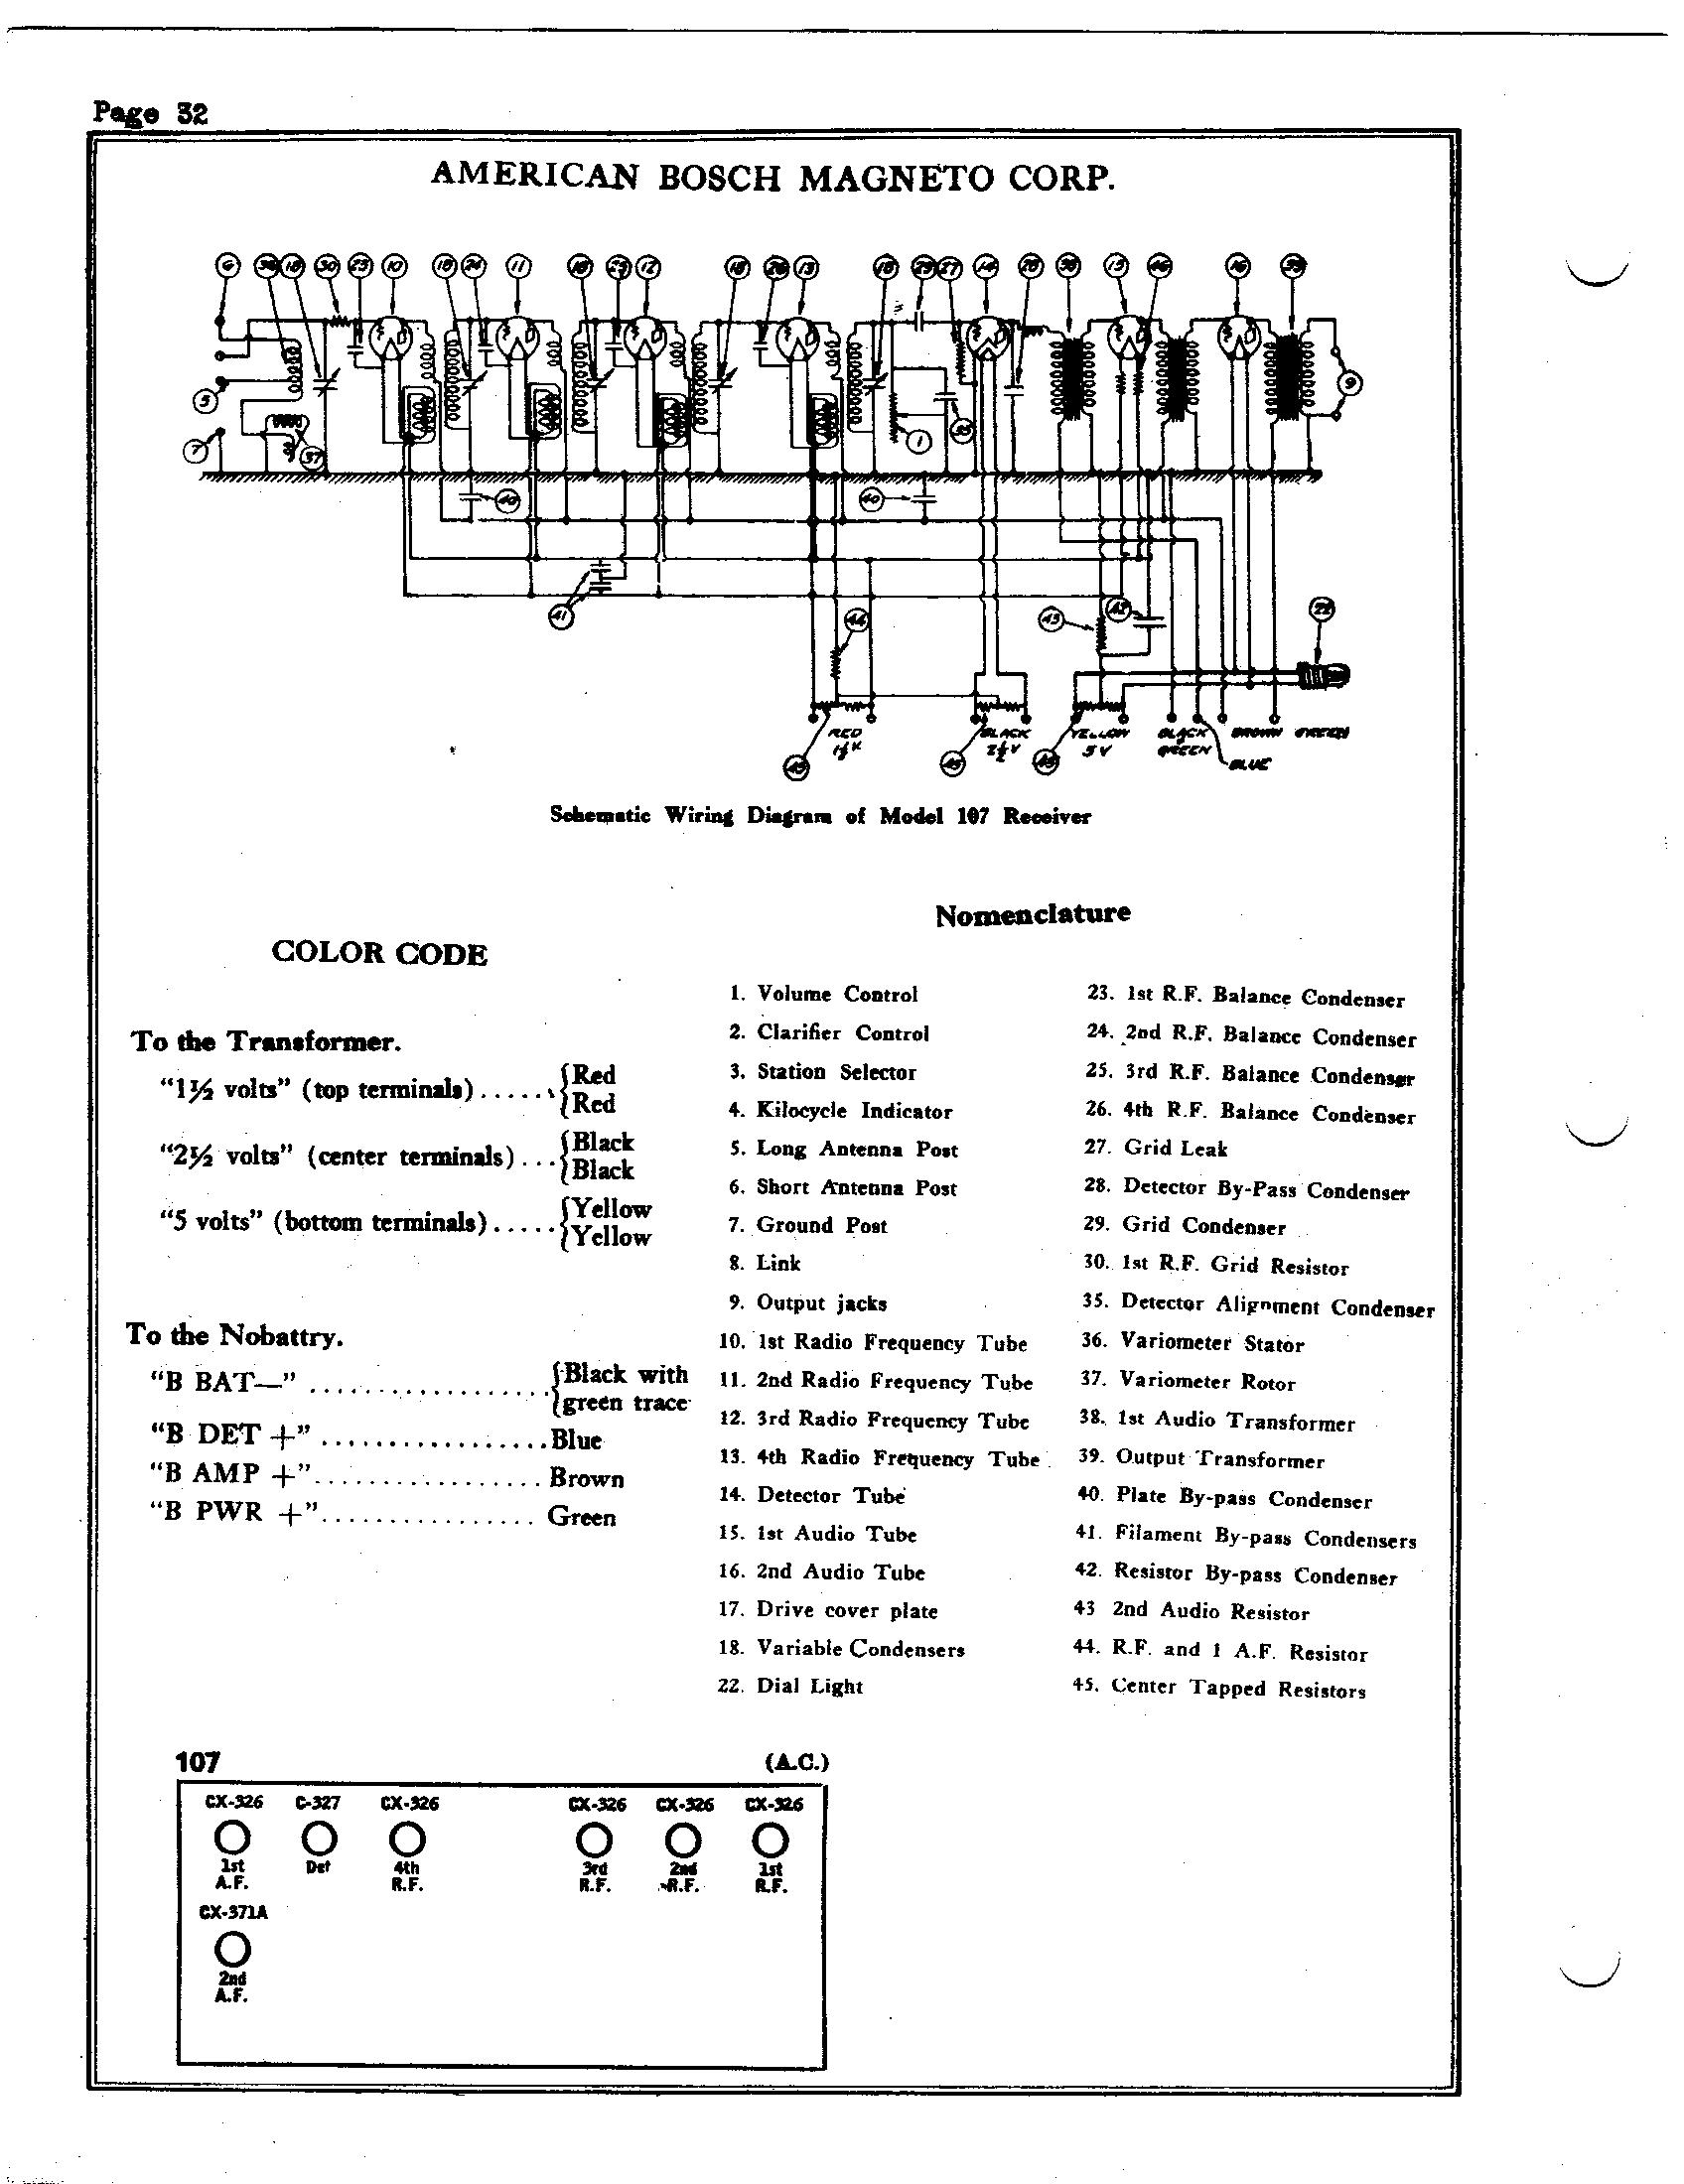 American Bosch 107